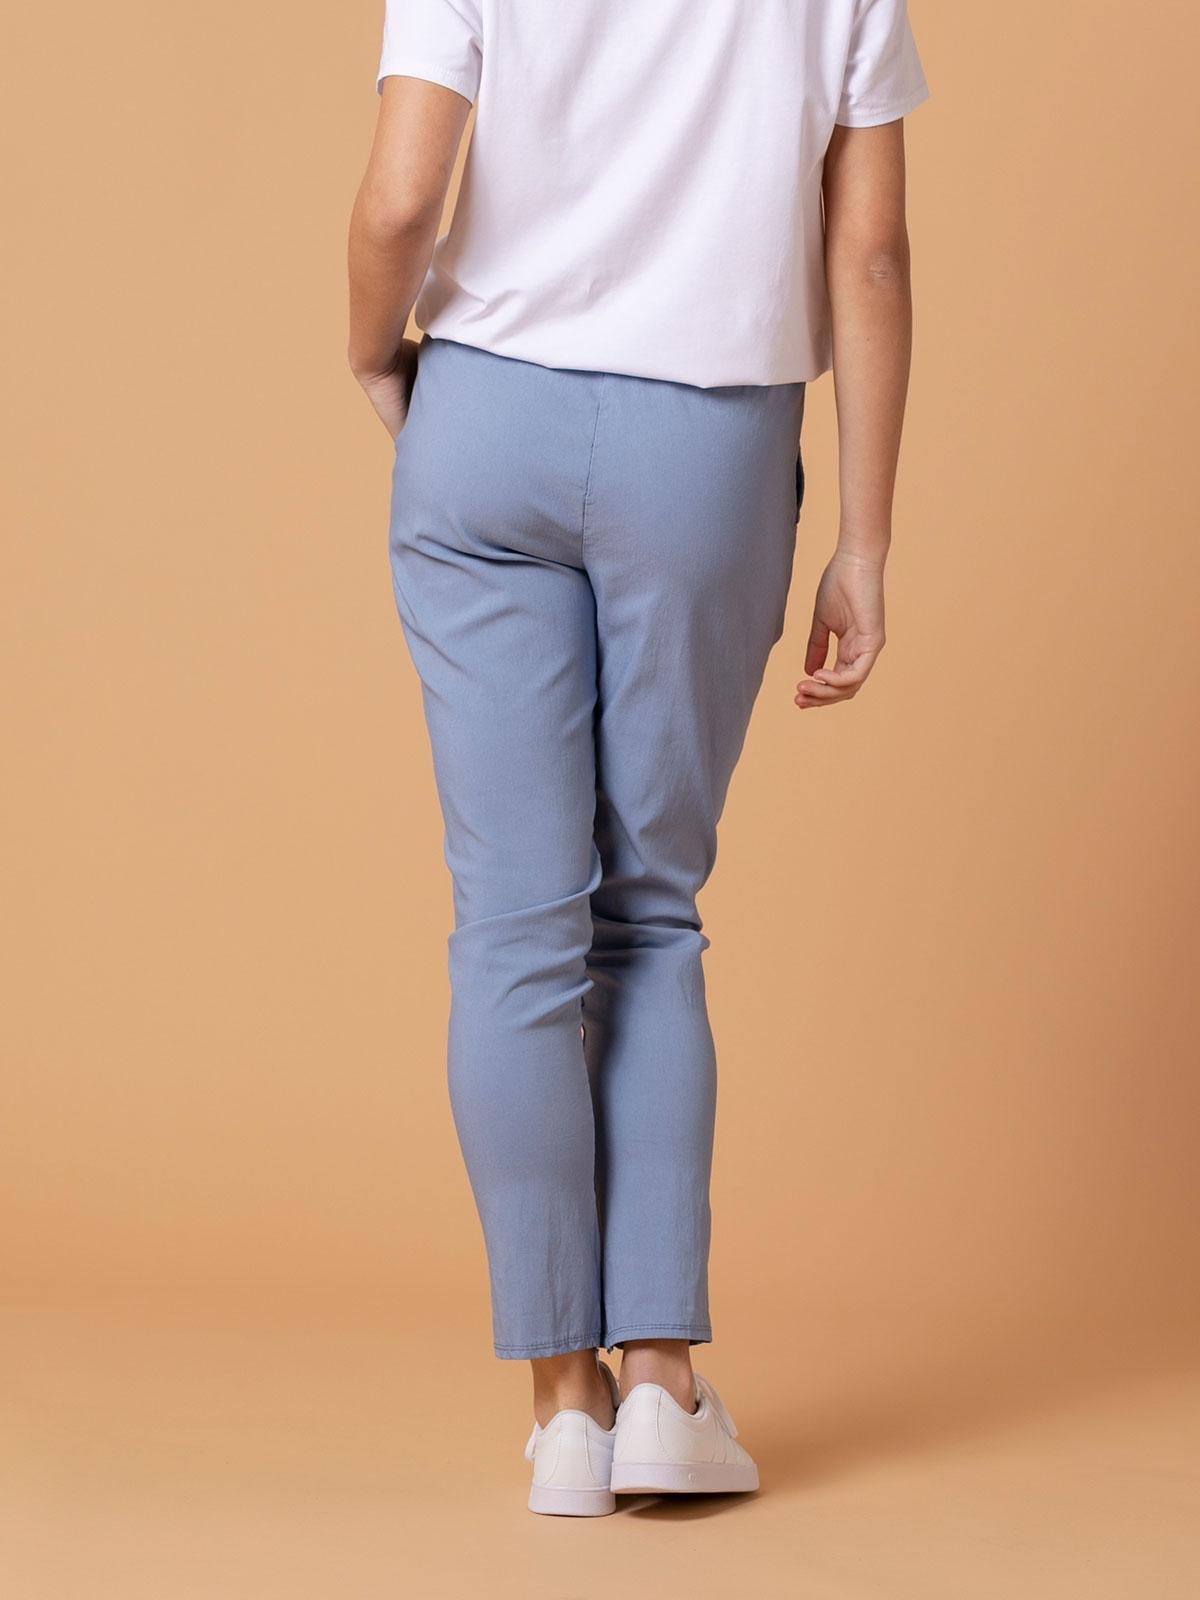 Pantalón mujer sport elástico algodón Azul